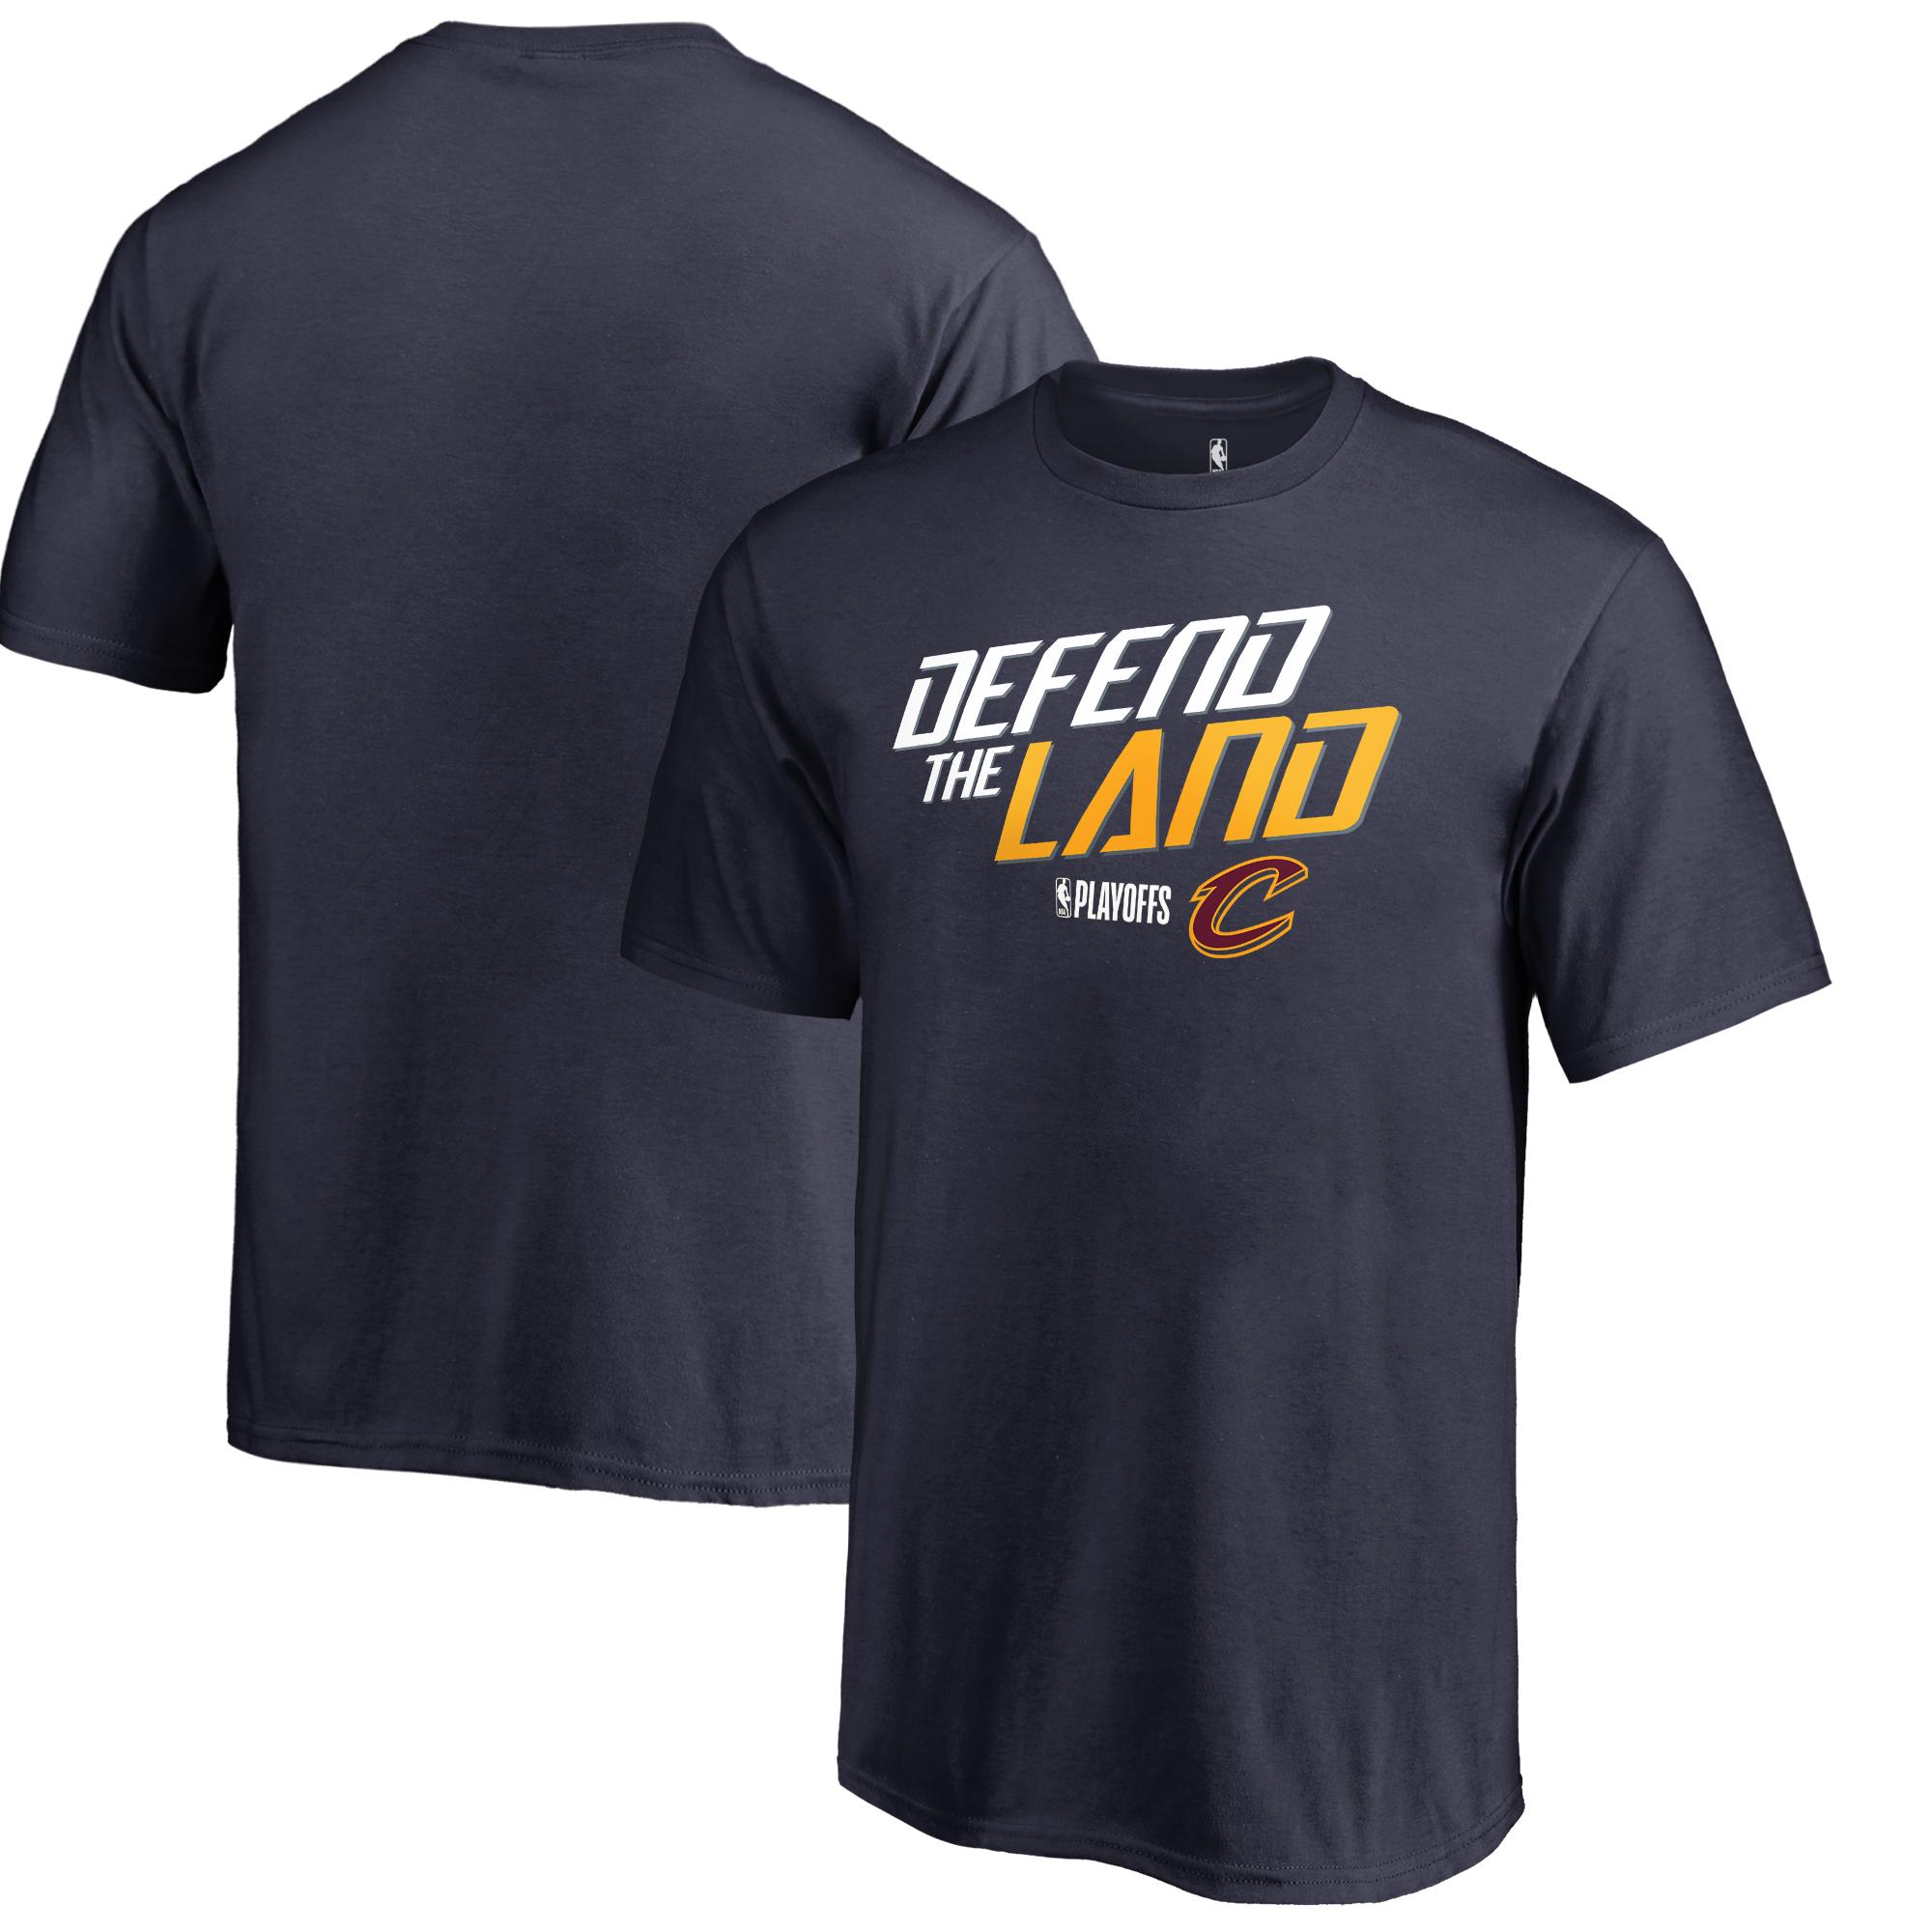 Cleveland Cavaliers Fanatics Branded Youth 2018 NBA Playoffs Slogan T-Shirt -Navy